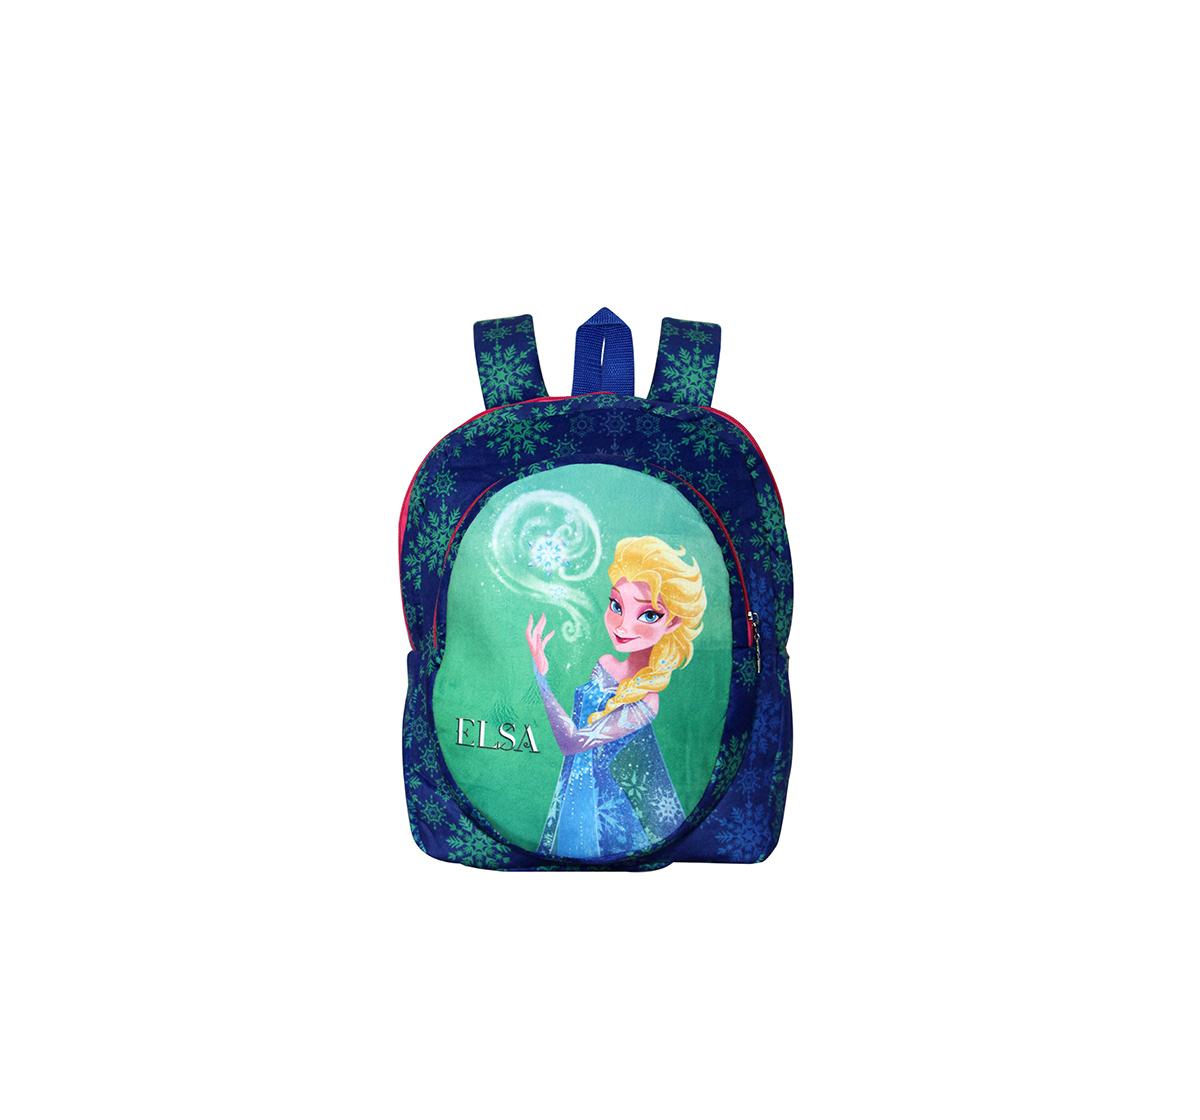 Disney | Disney Happiness Unisex Zipper Closure Frozen Elsa Backpack_Blue_Free Size Plush Accessories for Kids age 12M+ - 35 Cm